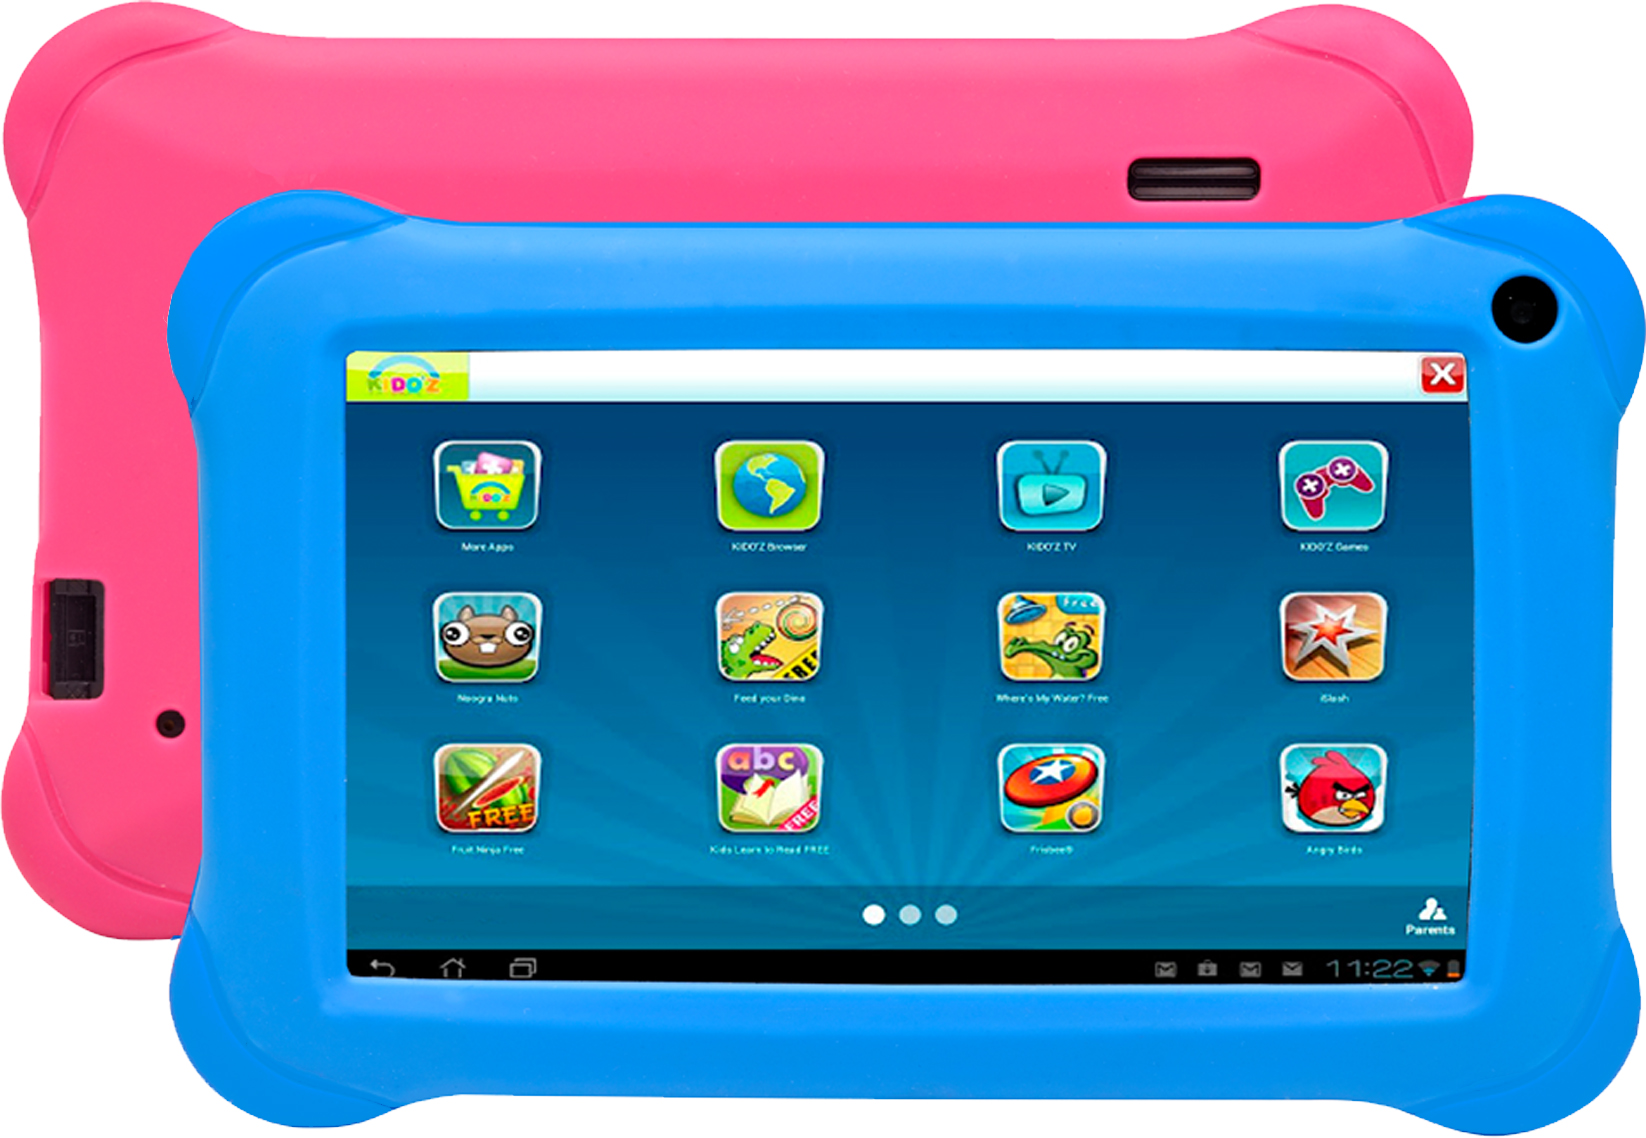 Denver TAQ-70282K 7/8GB/WI-FI/ANDROID6/BLUE PINK 5706751034442 Planšetdators